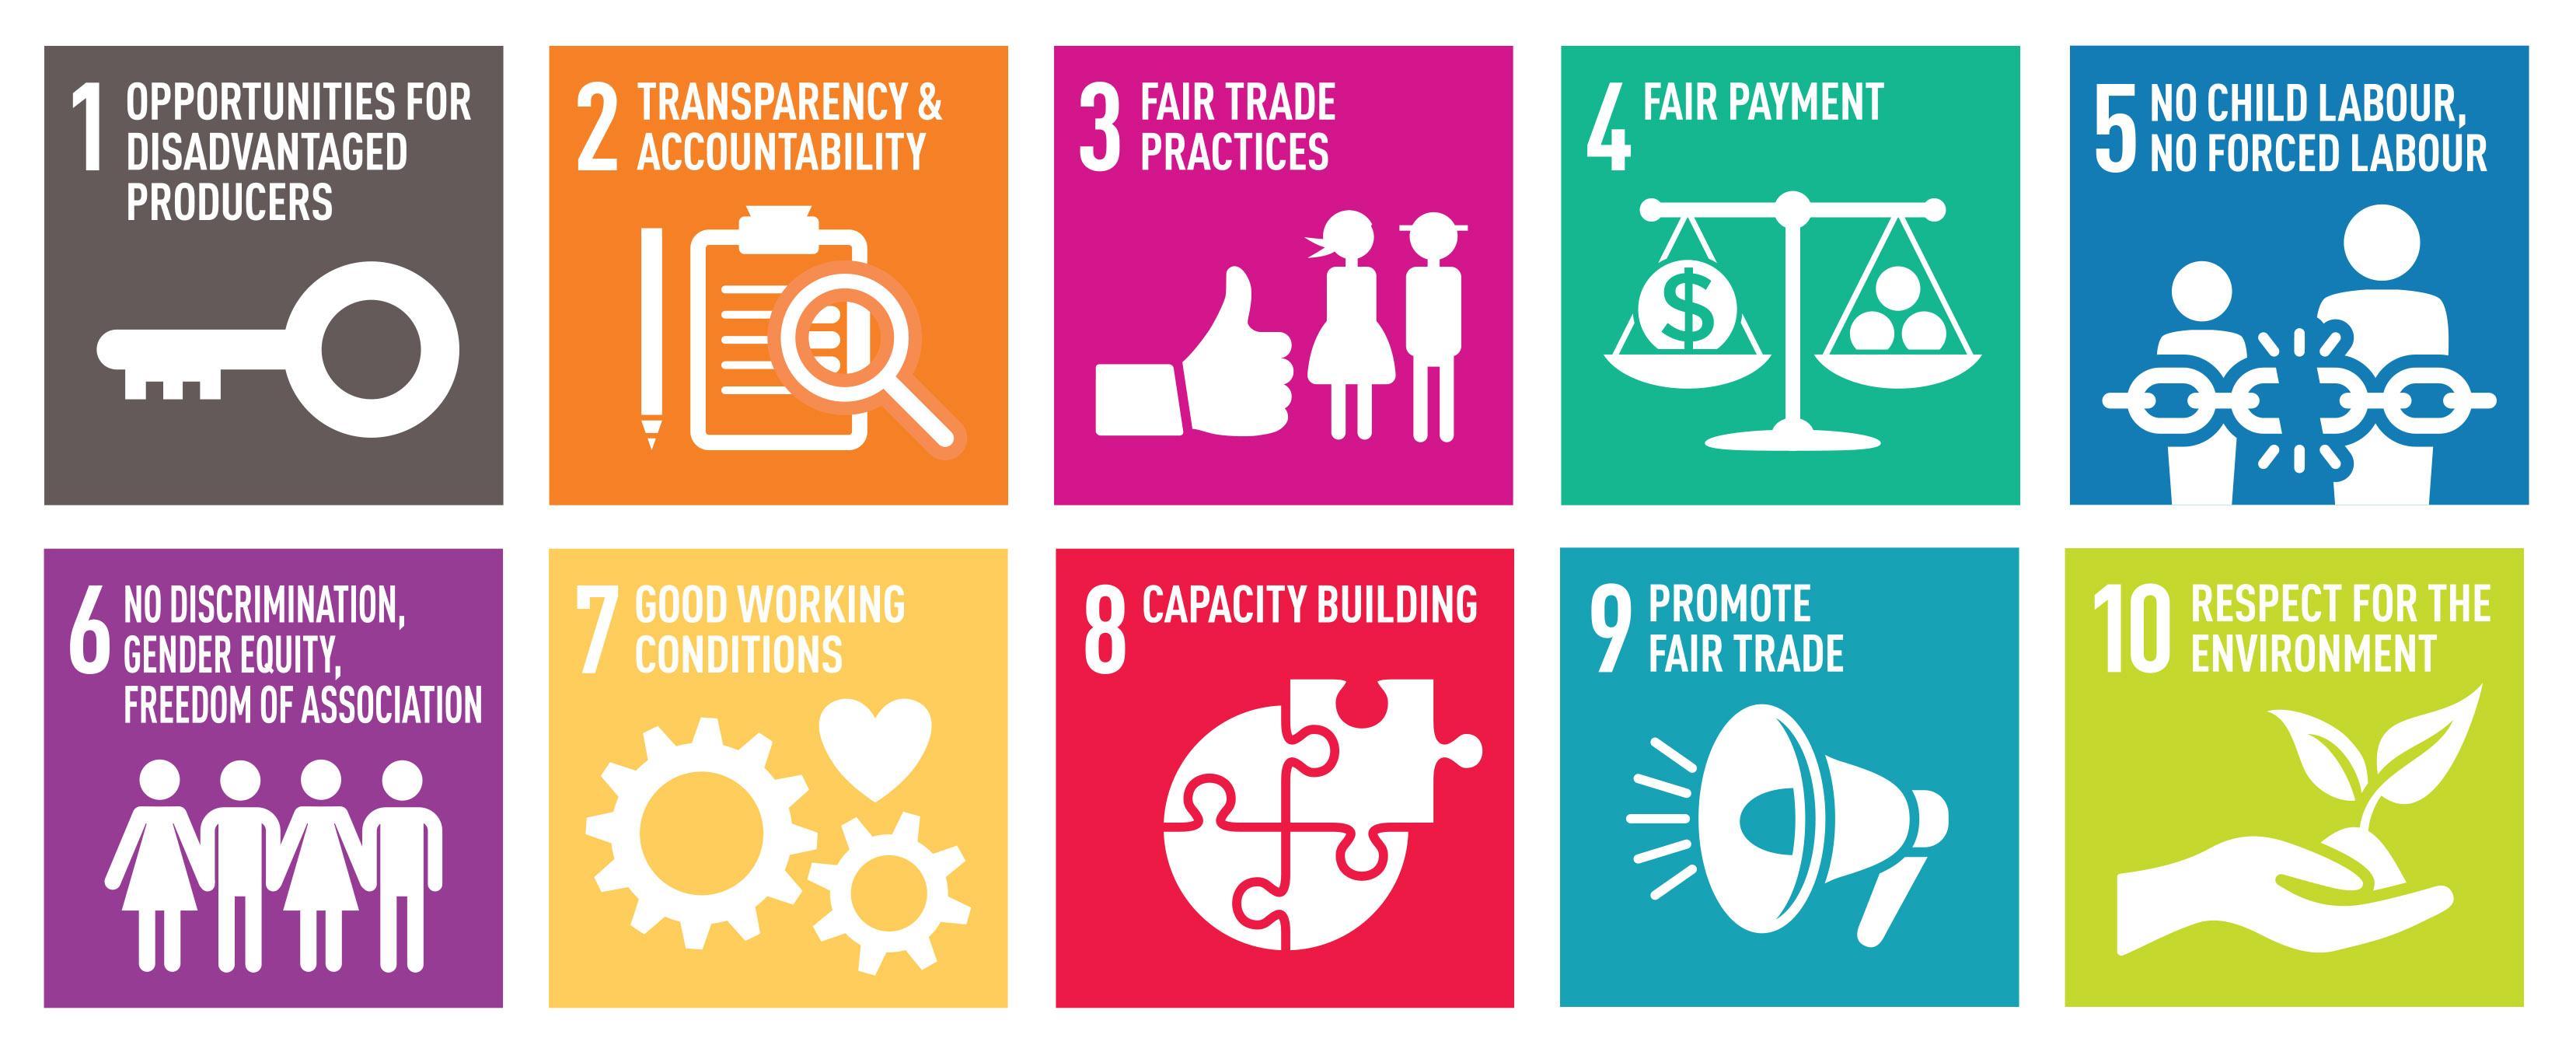 WHO WE ARE | World Fair Trade Organization